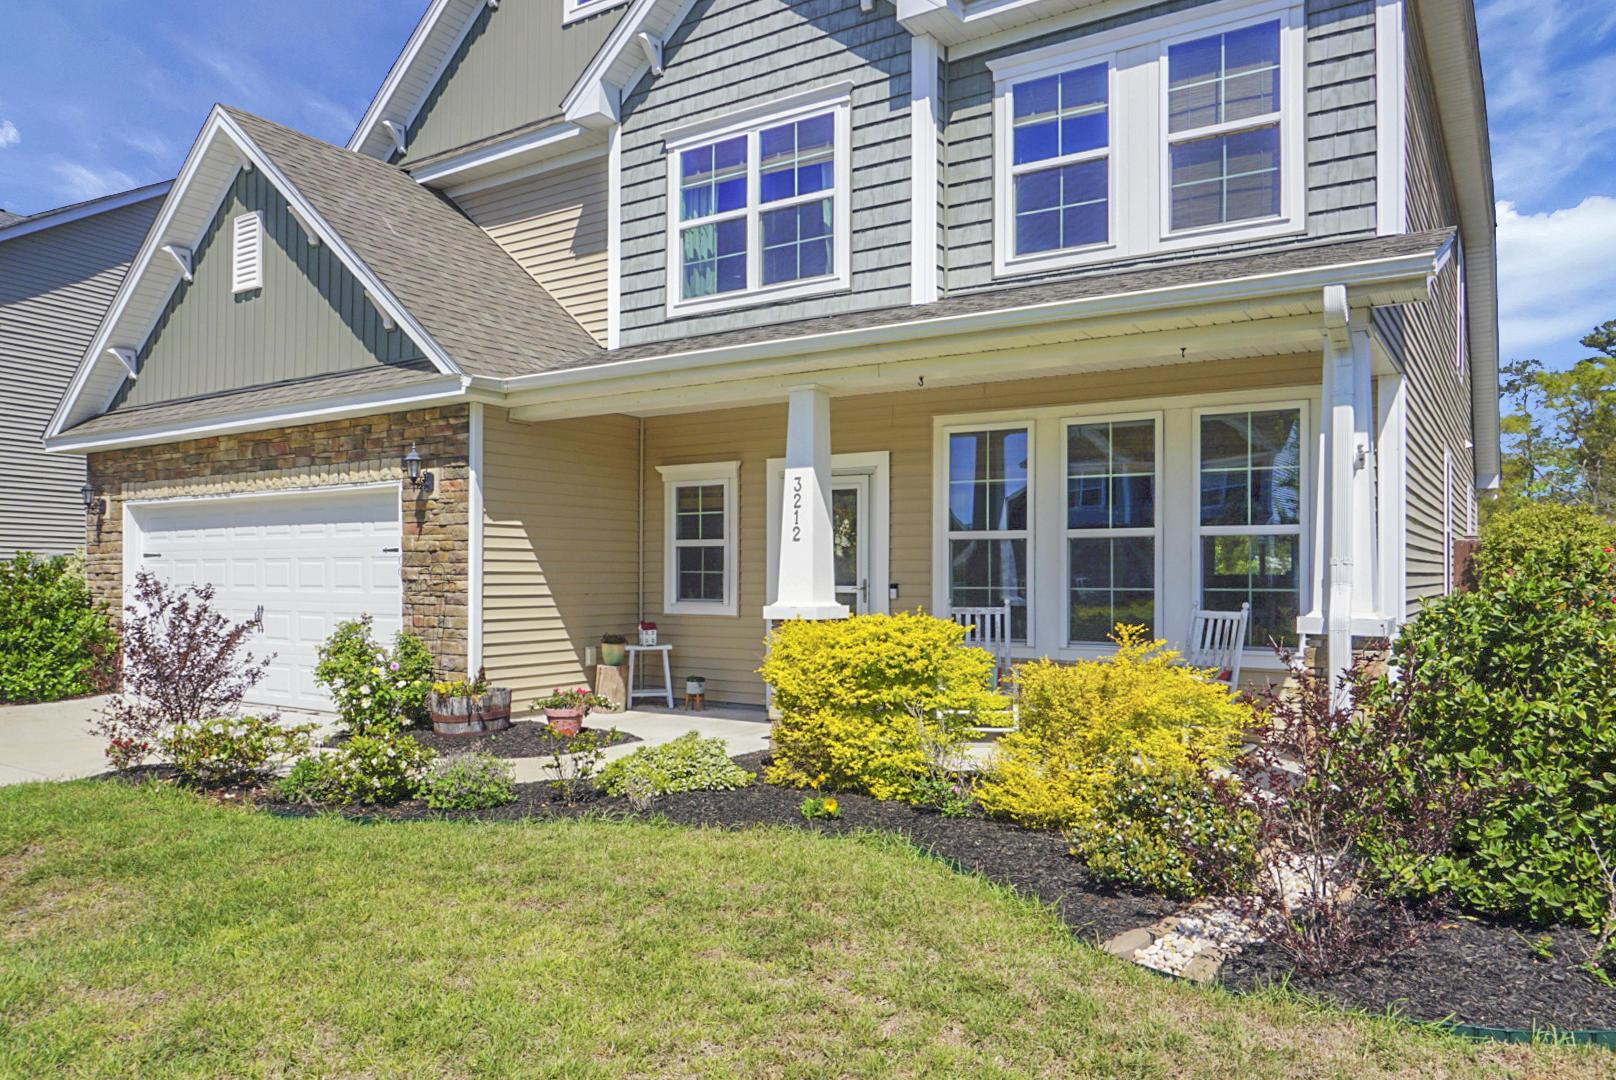 Fenwick Woods Homes For Sale - 3212 Dunwick, Johns Island, SC - 48